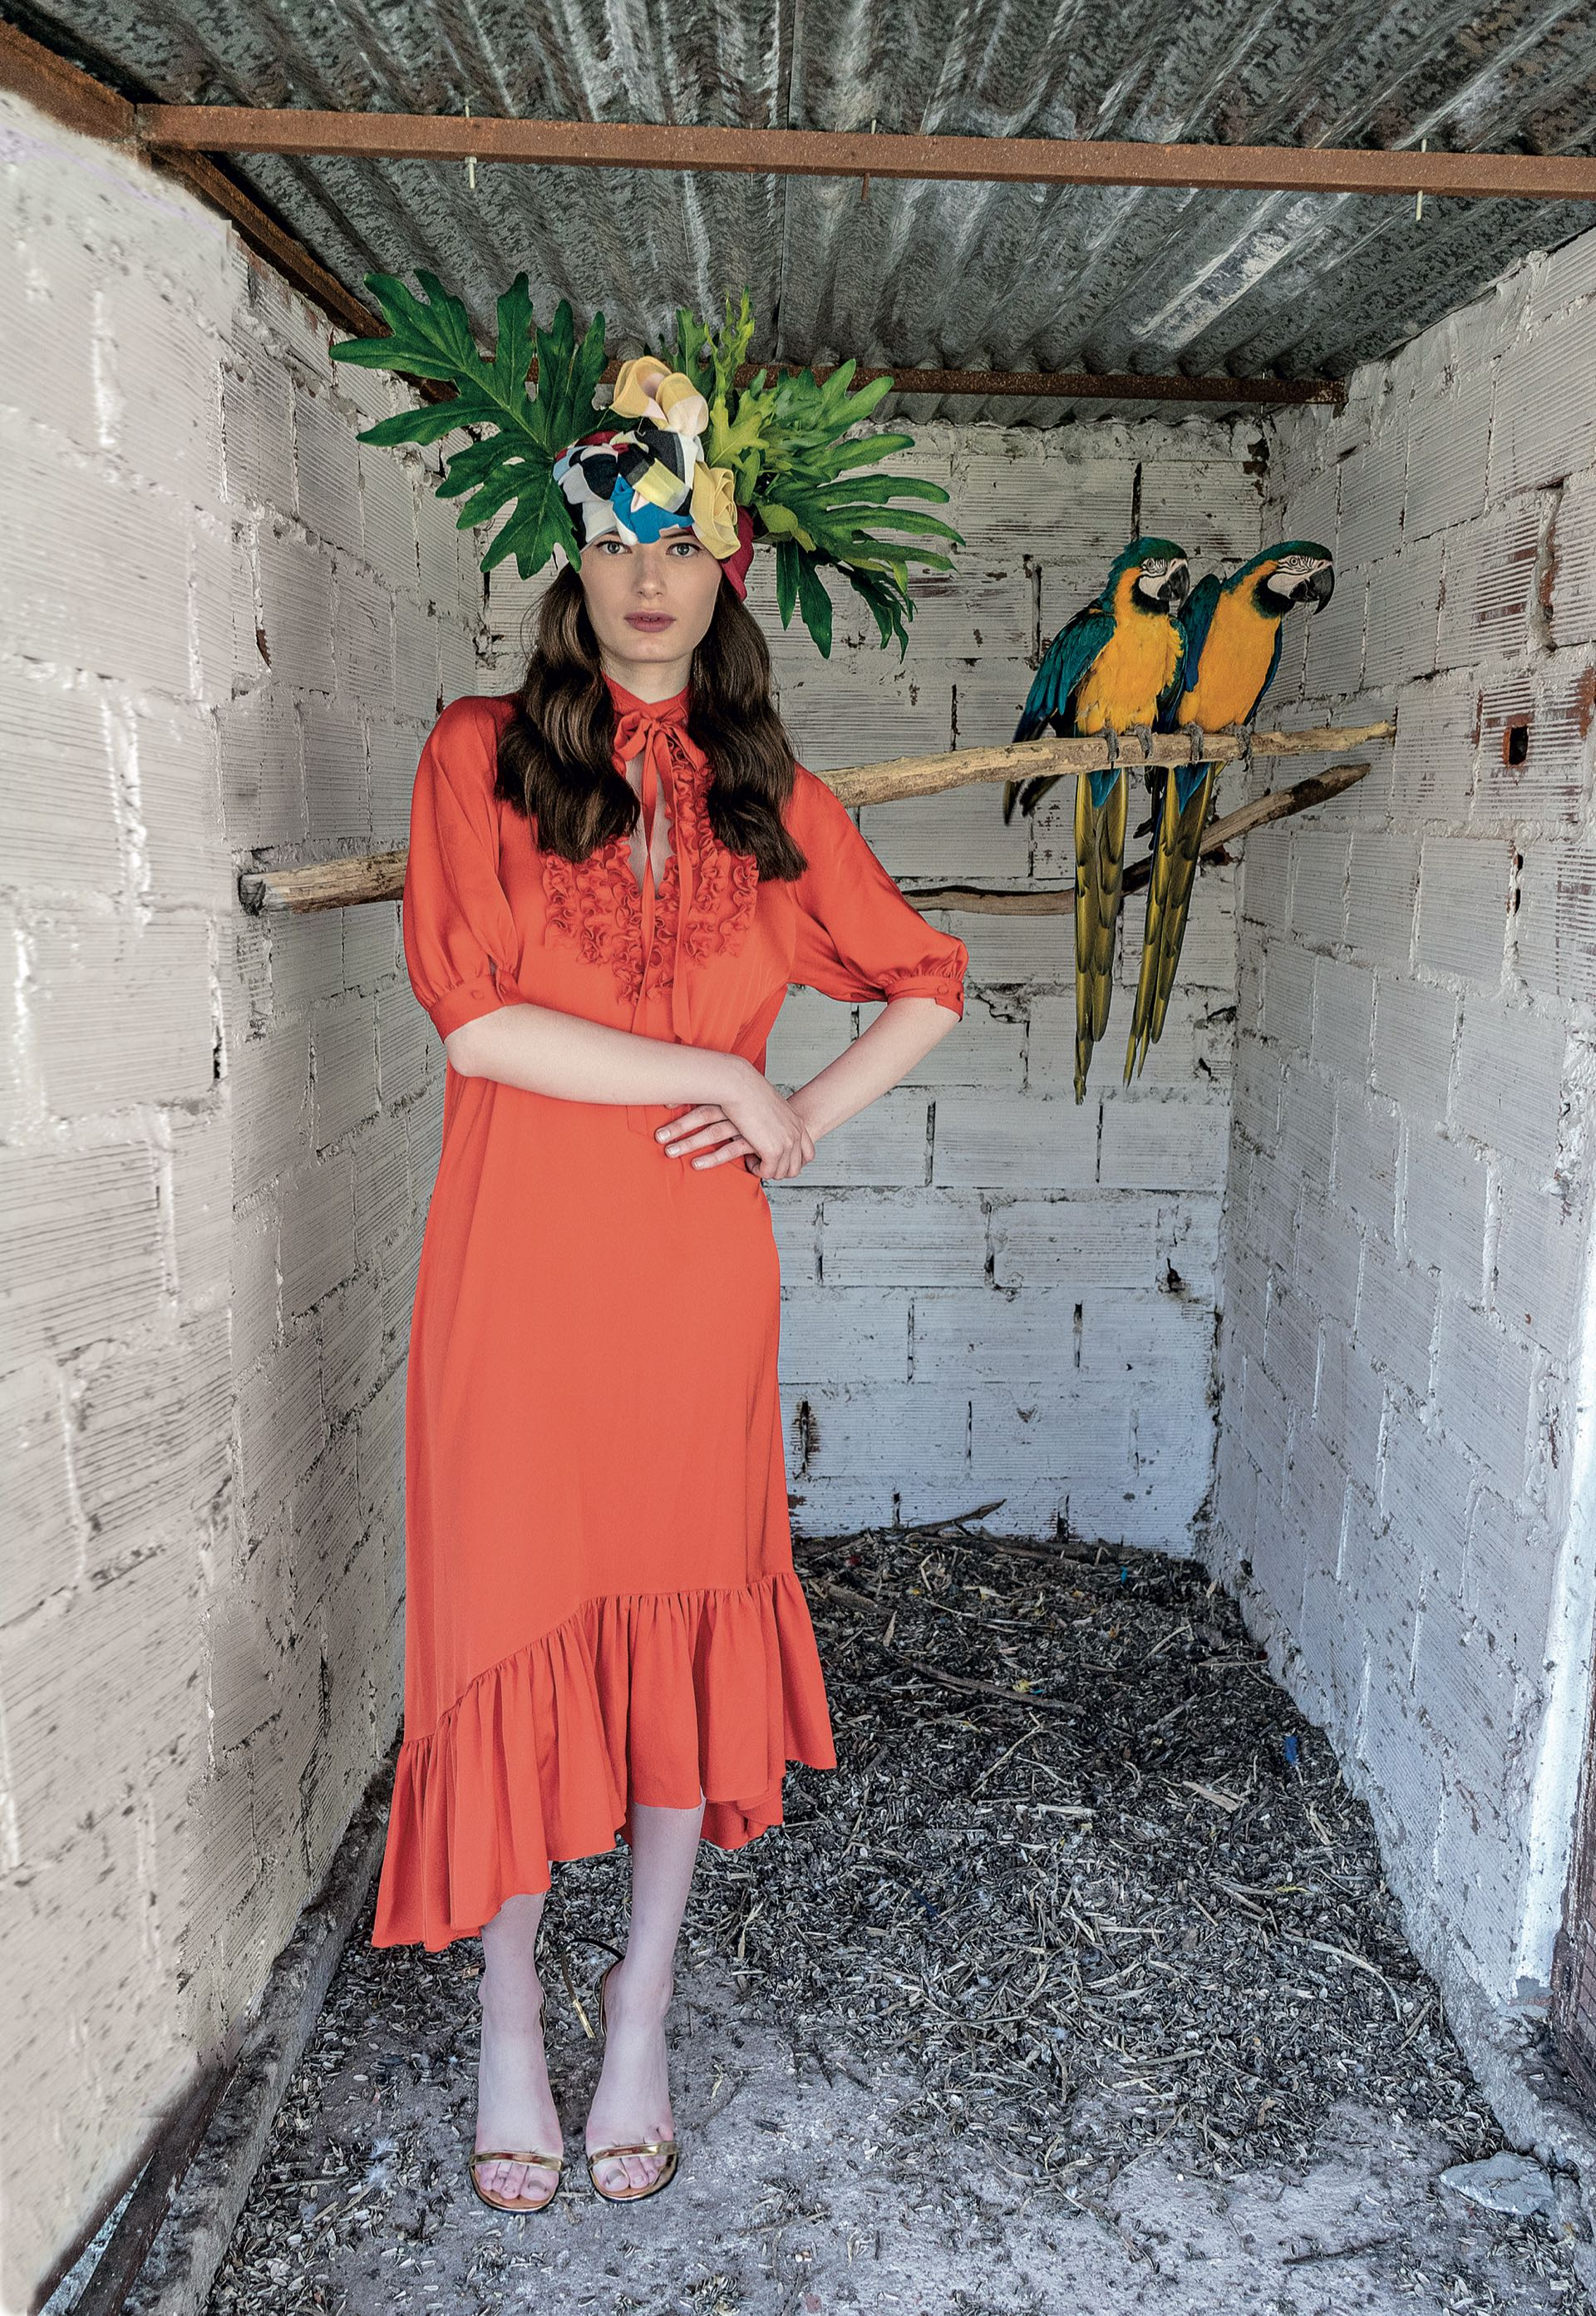 Vestido de seda natural y sandalias (Evangelina Bomparola).(Foto: Juan Jauregui/ Para Ti)